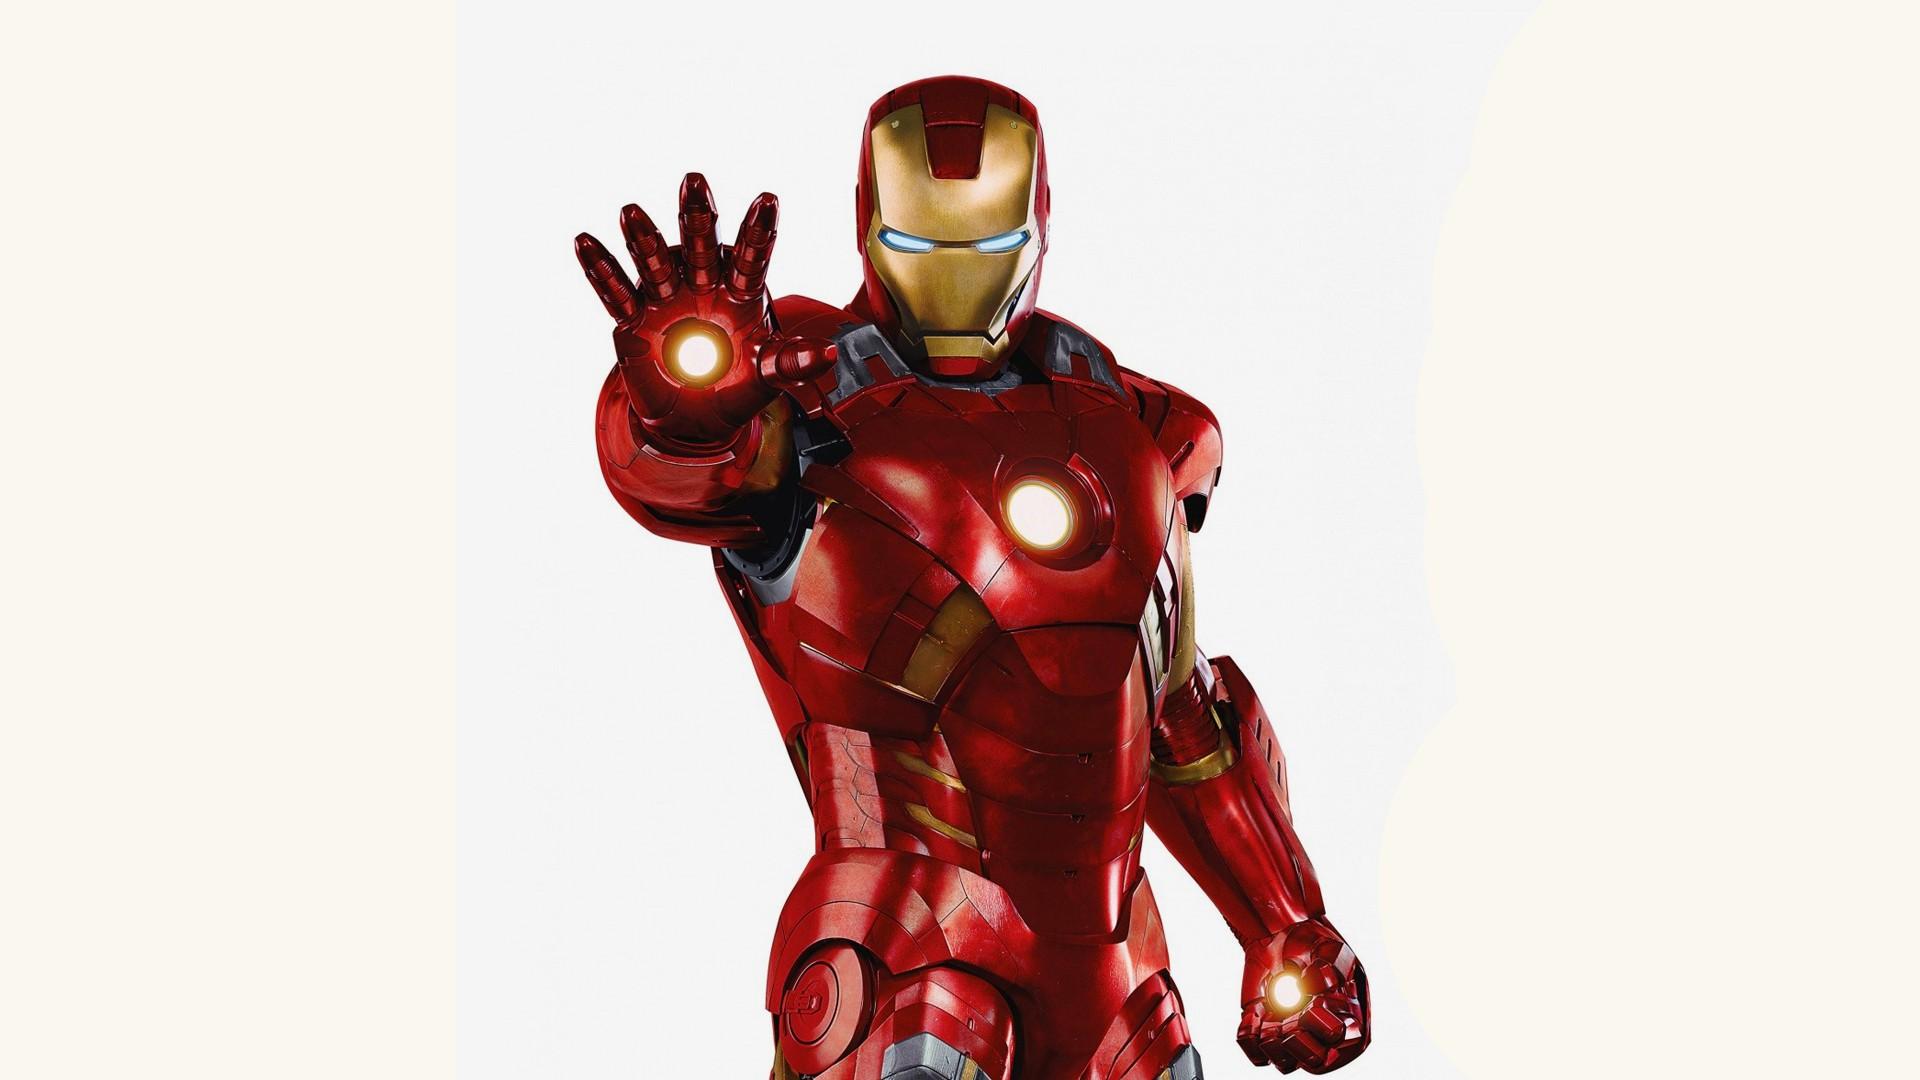 Traje de Iron Man - 1920x1080